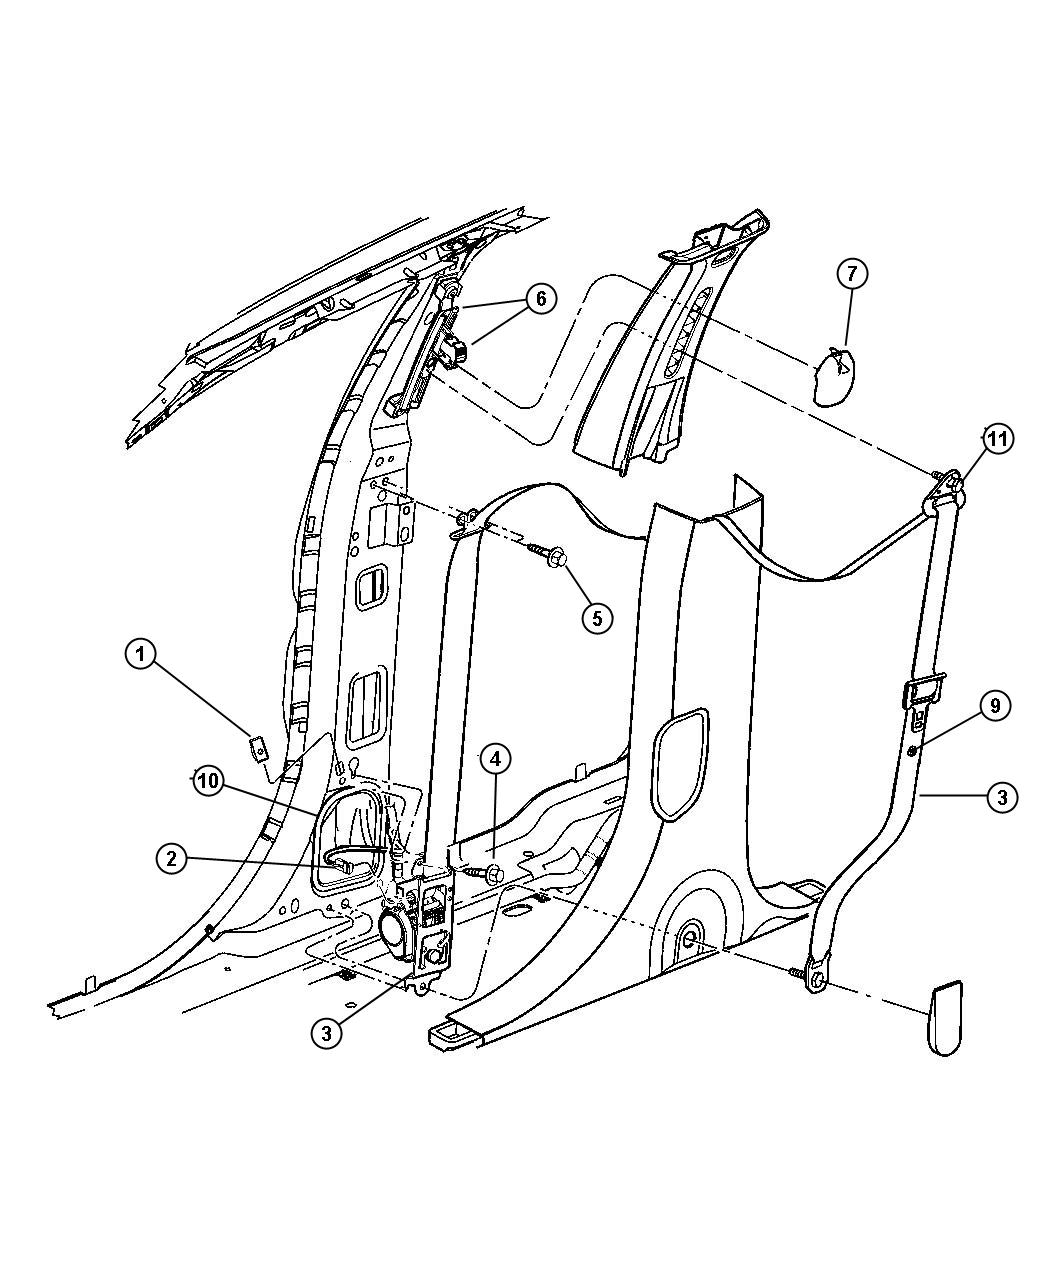 Chrysler Pacifica Adjuster. Seat belt turning loop. Trim